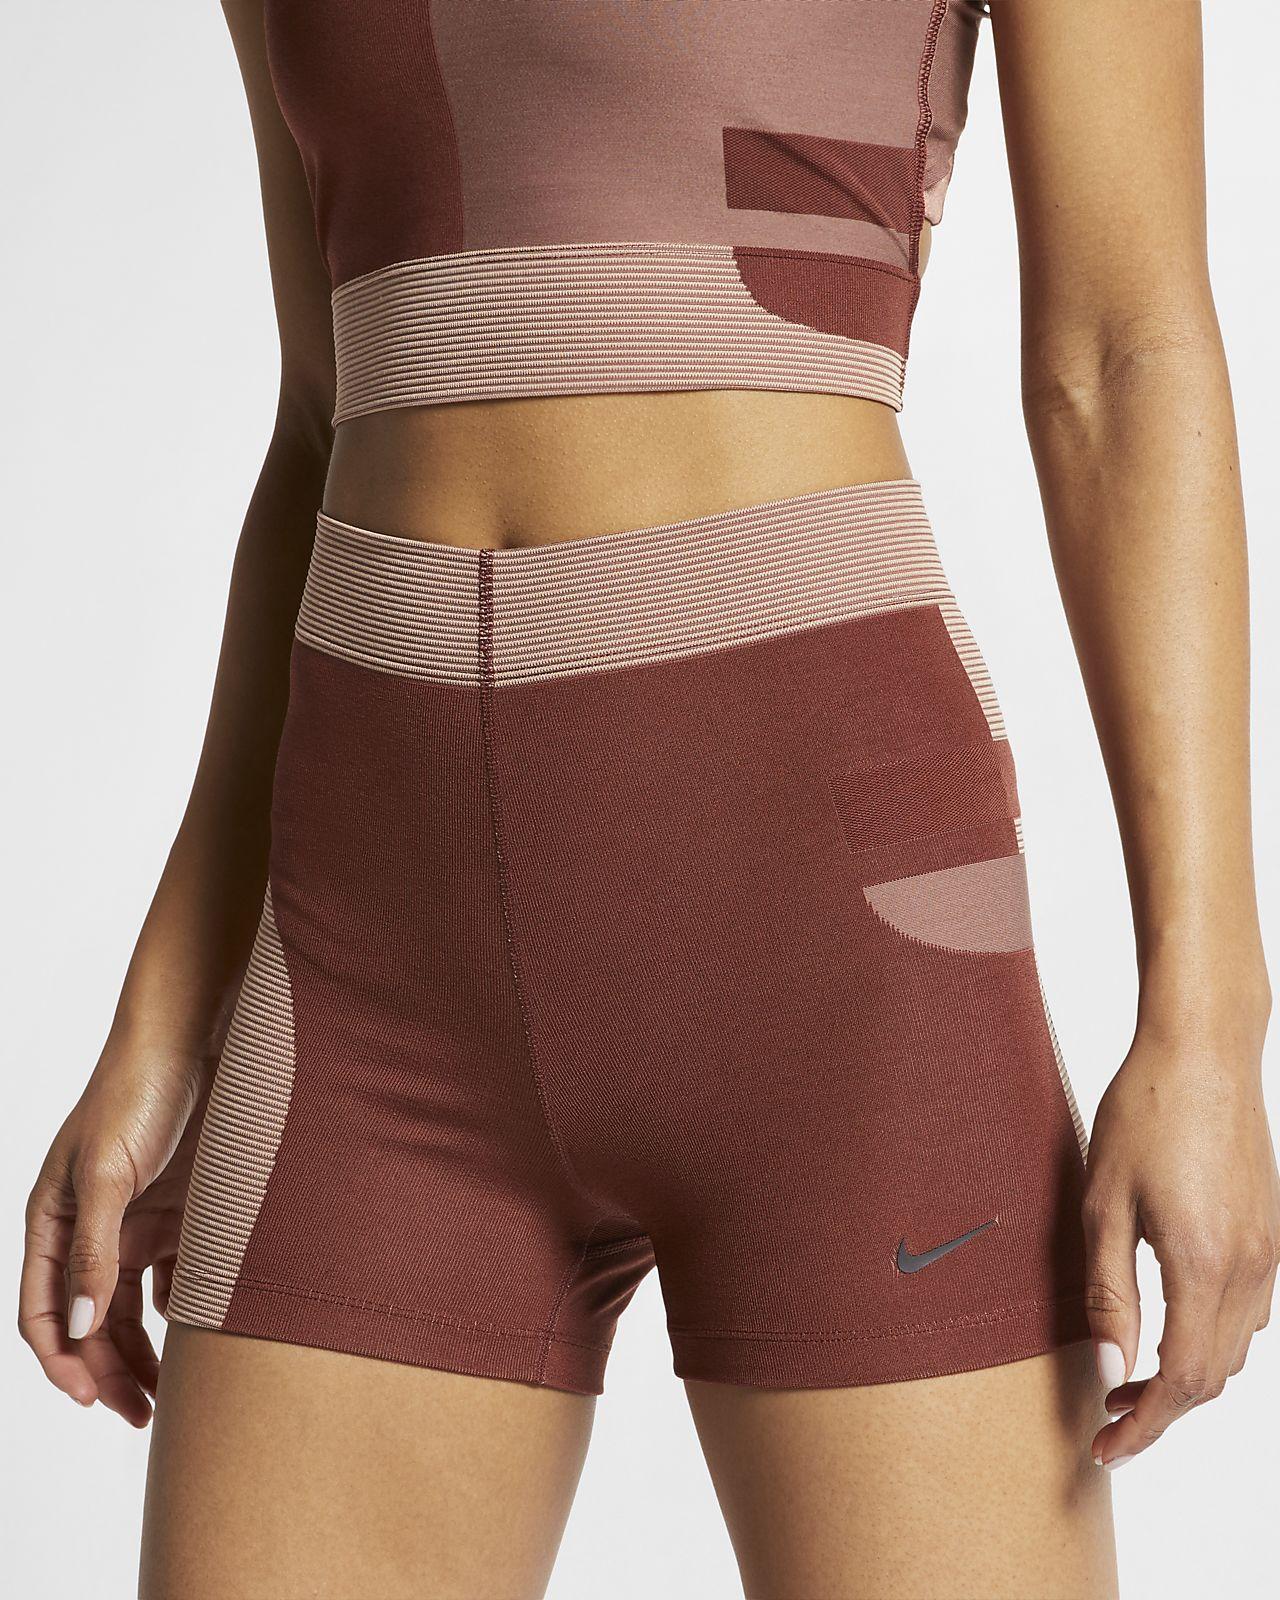 Shorts de 7,5 cm para mujer Nike Pro HyperCool